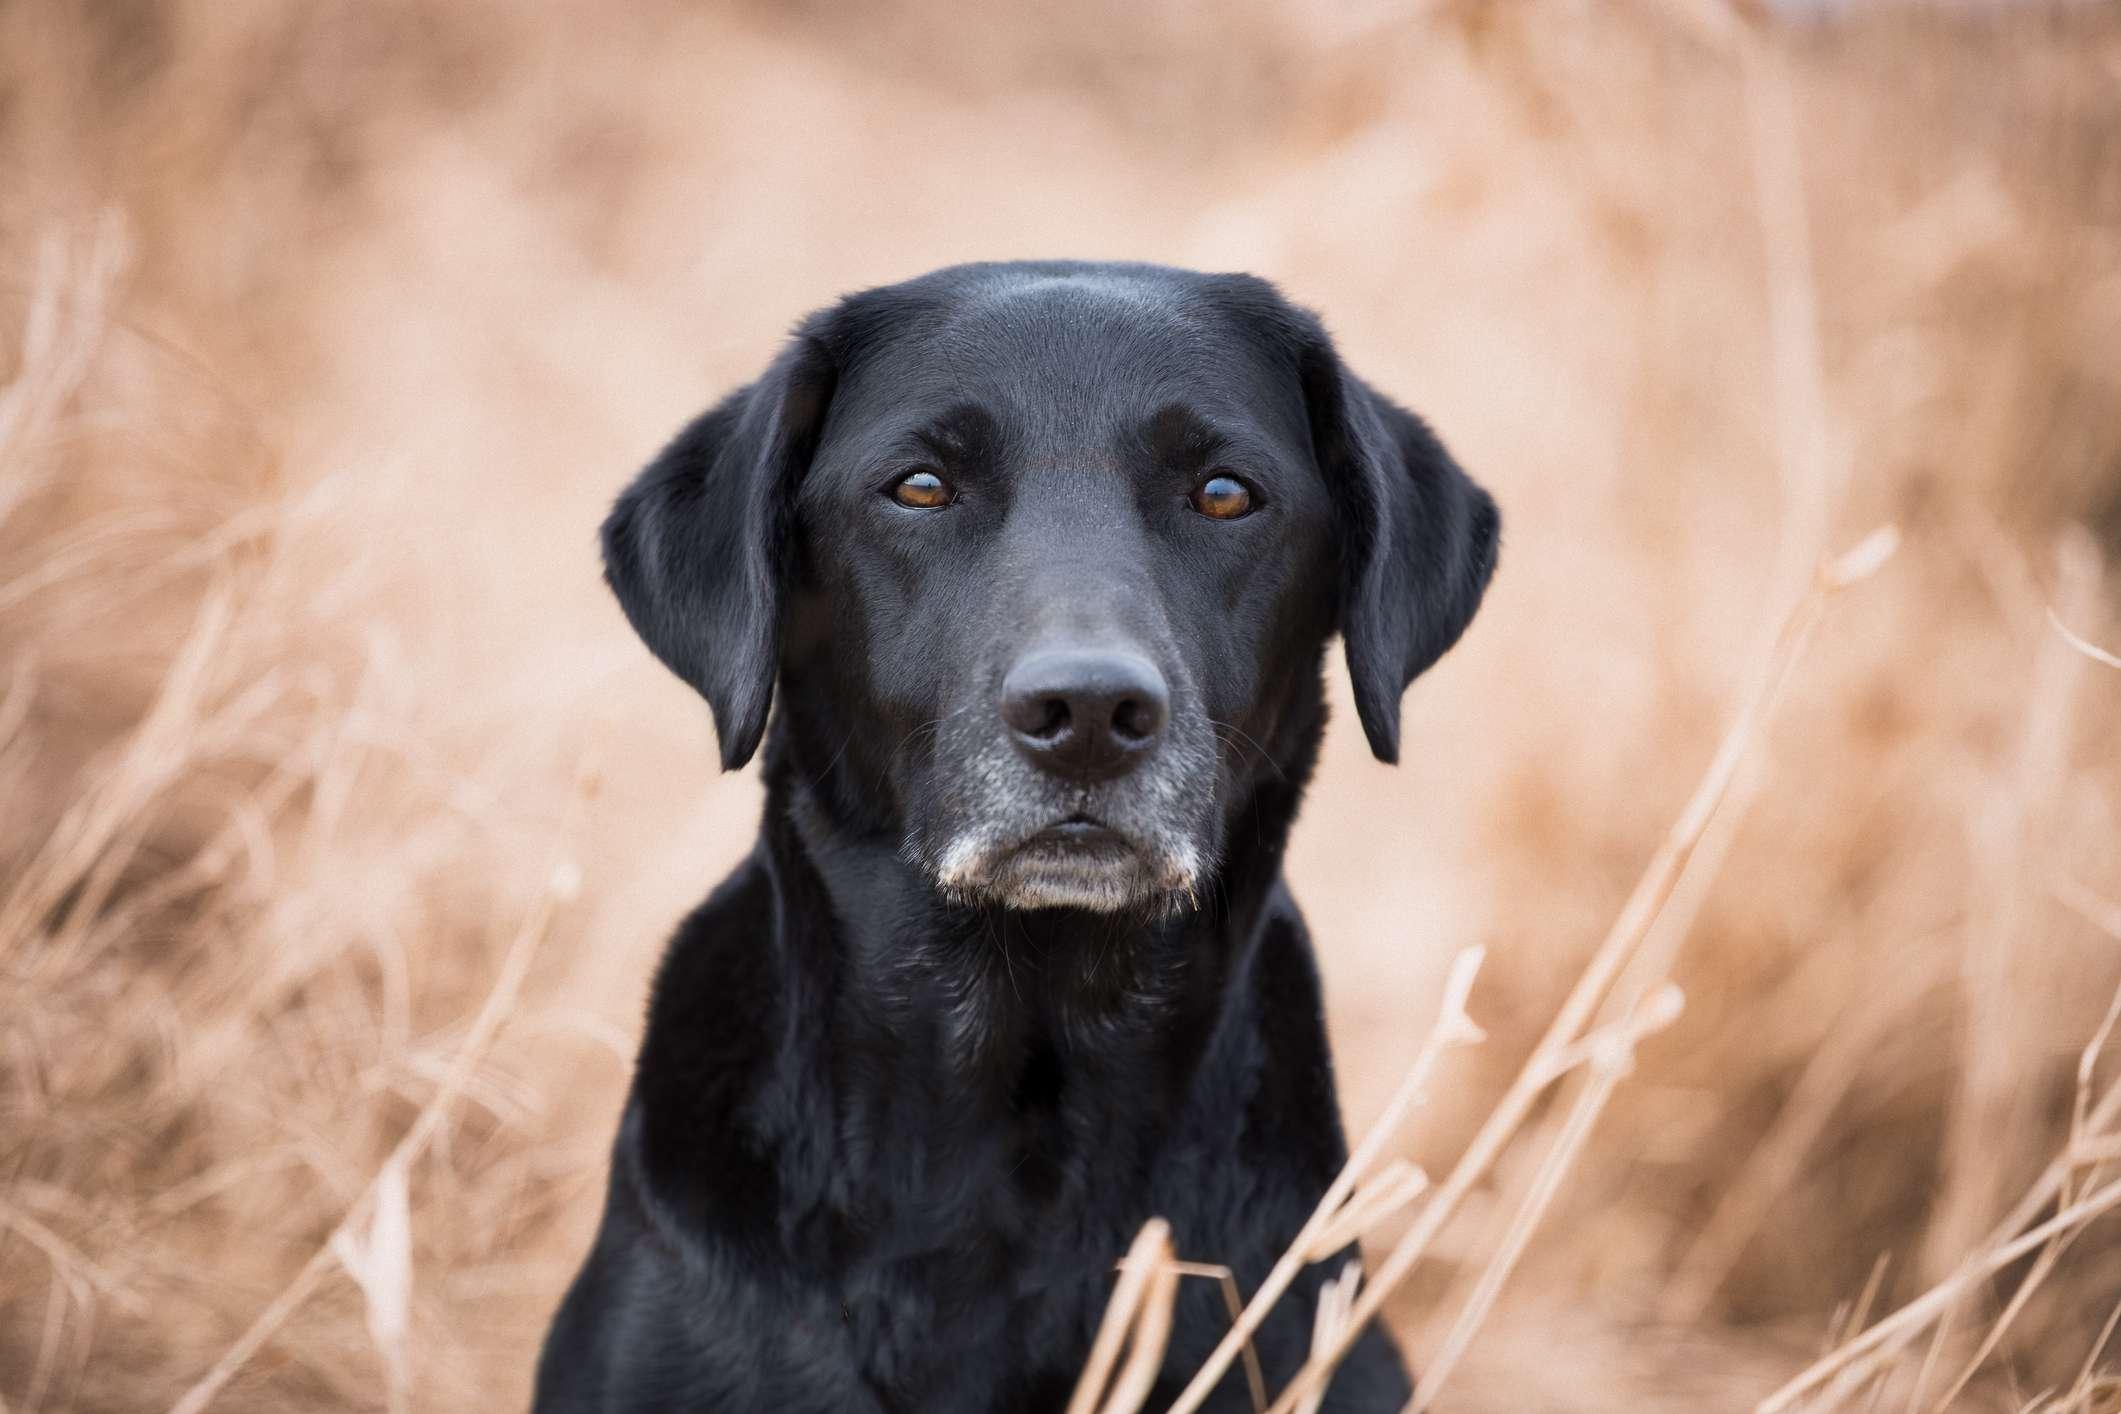 Black Labrador retriever sitting in dried grass